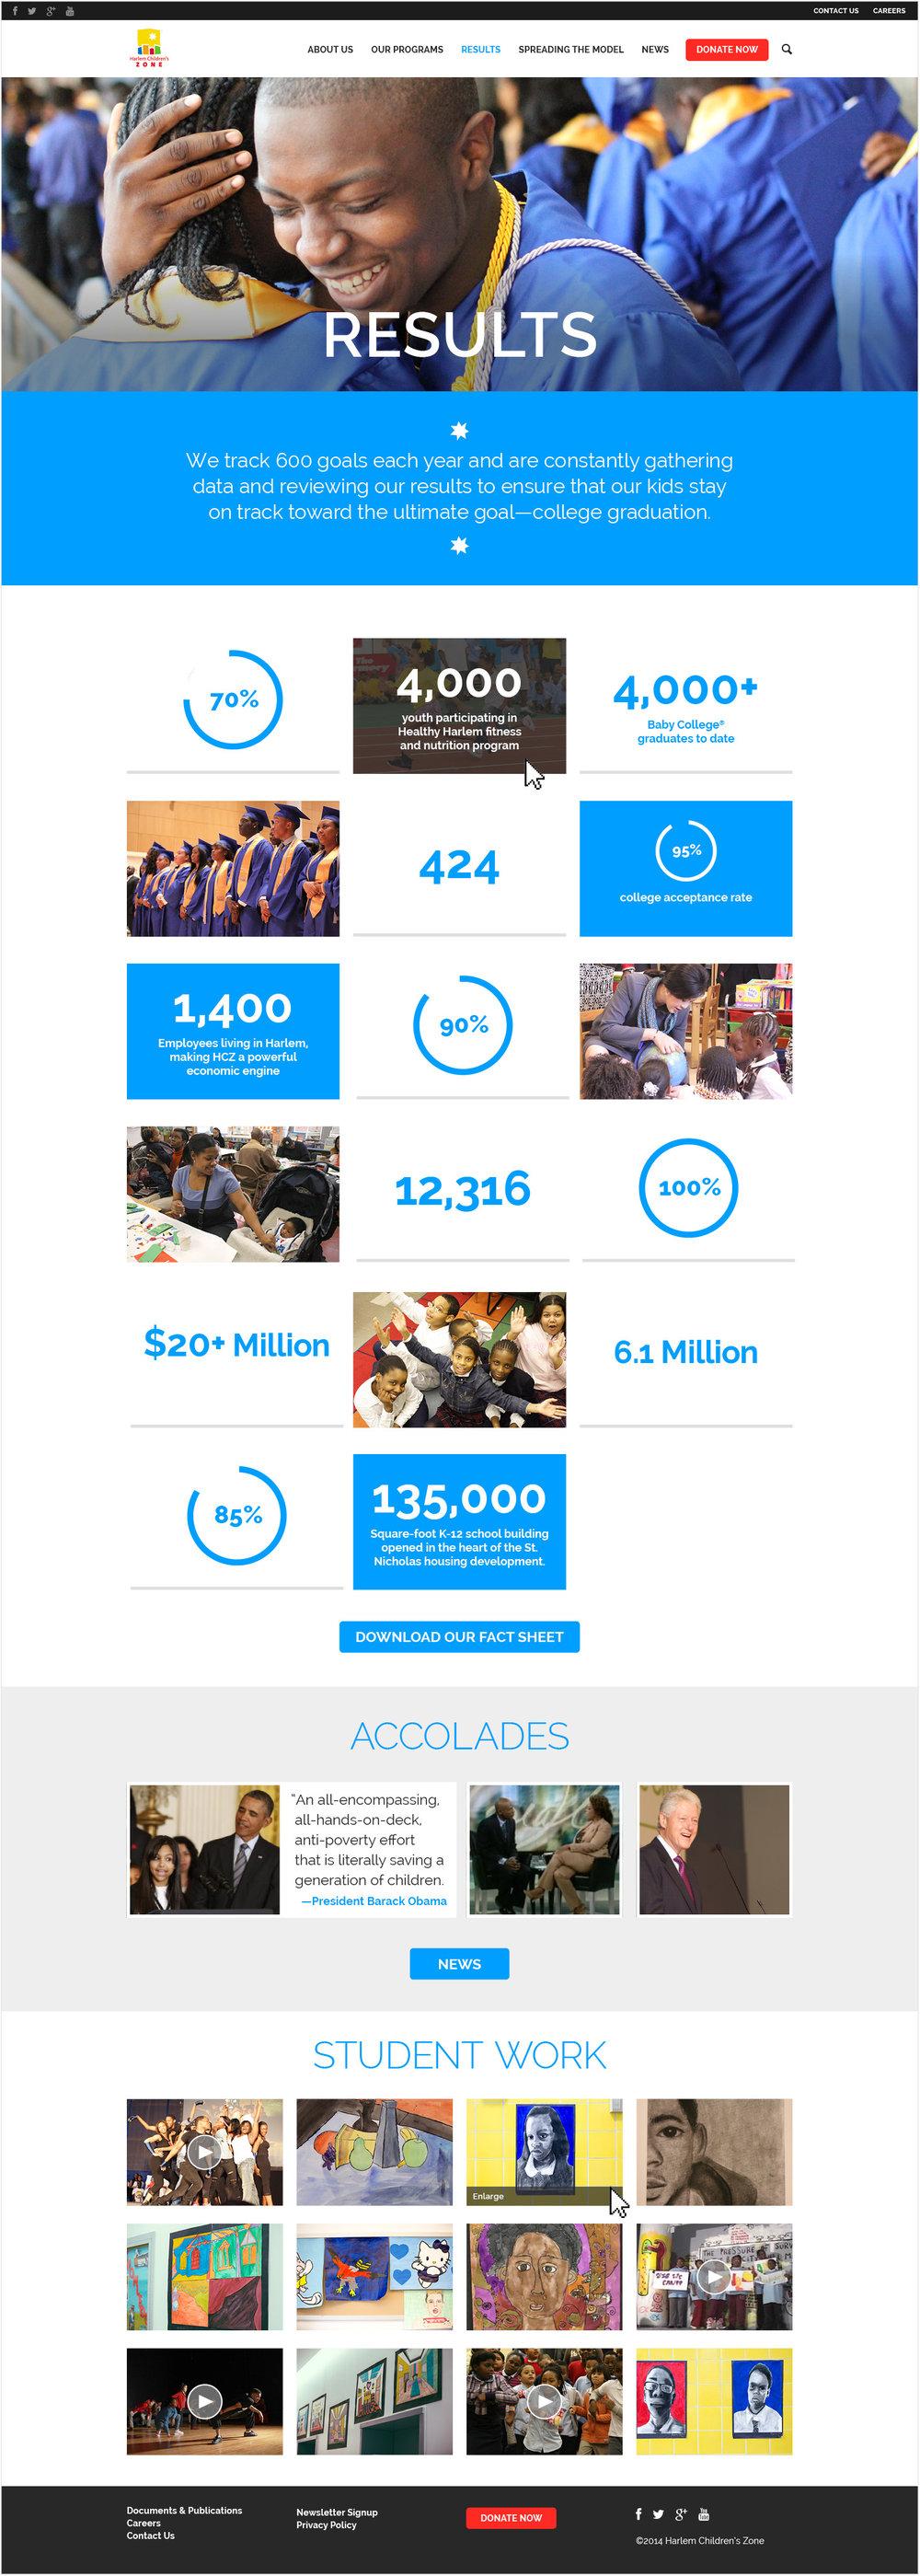 20140326_HCZ_Site-Results-4.jpg